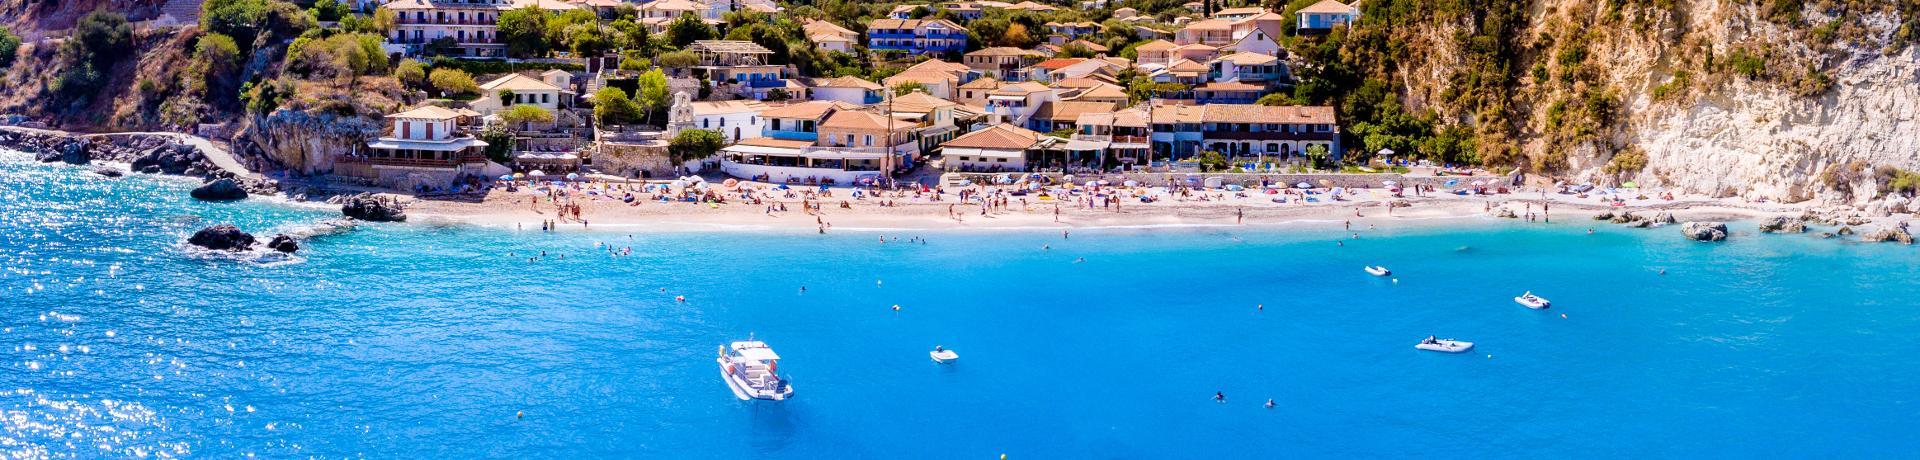 Vergleich Griechenland Emotion 1 - Lefkada - Agios Nikitas